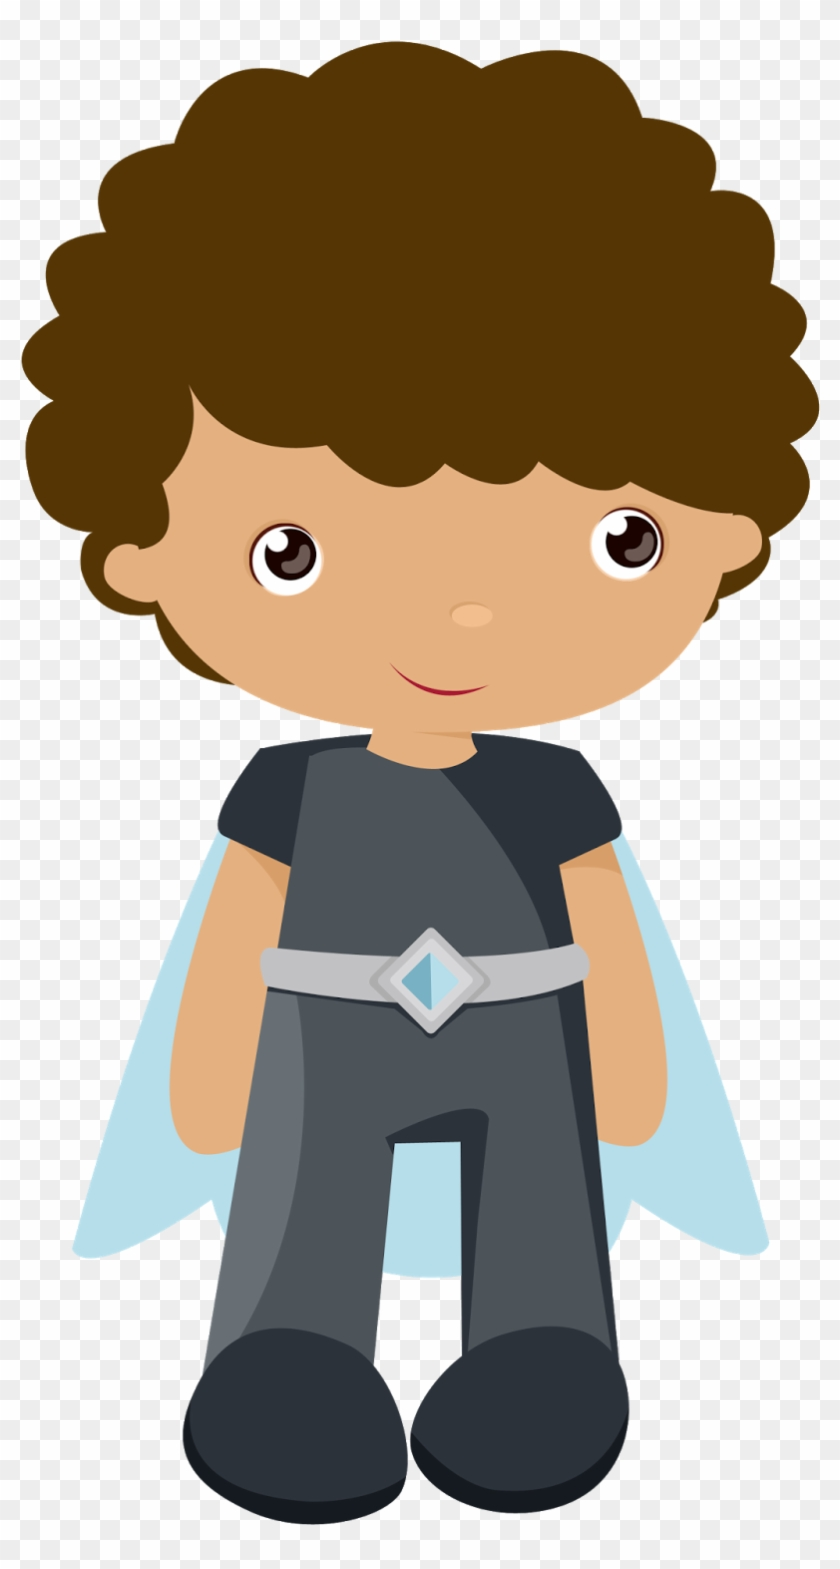 Kids Dressed As Superheroes Clipart - Principe De Cenicienta Kawaii #209517